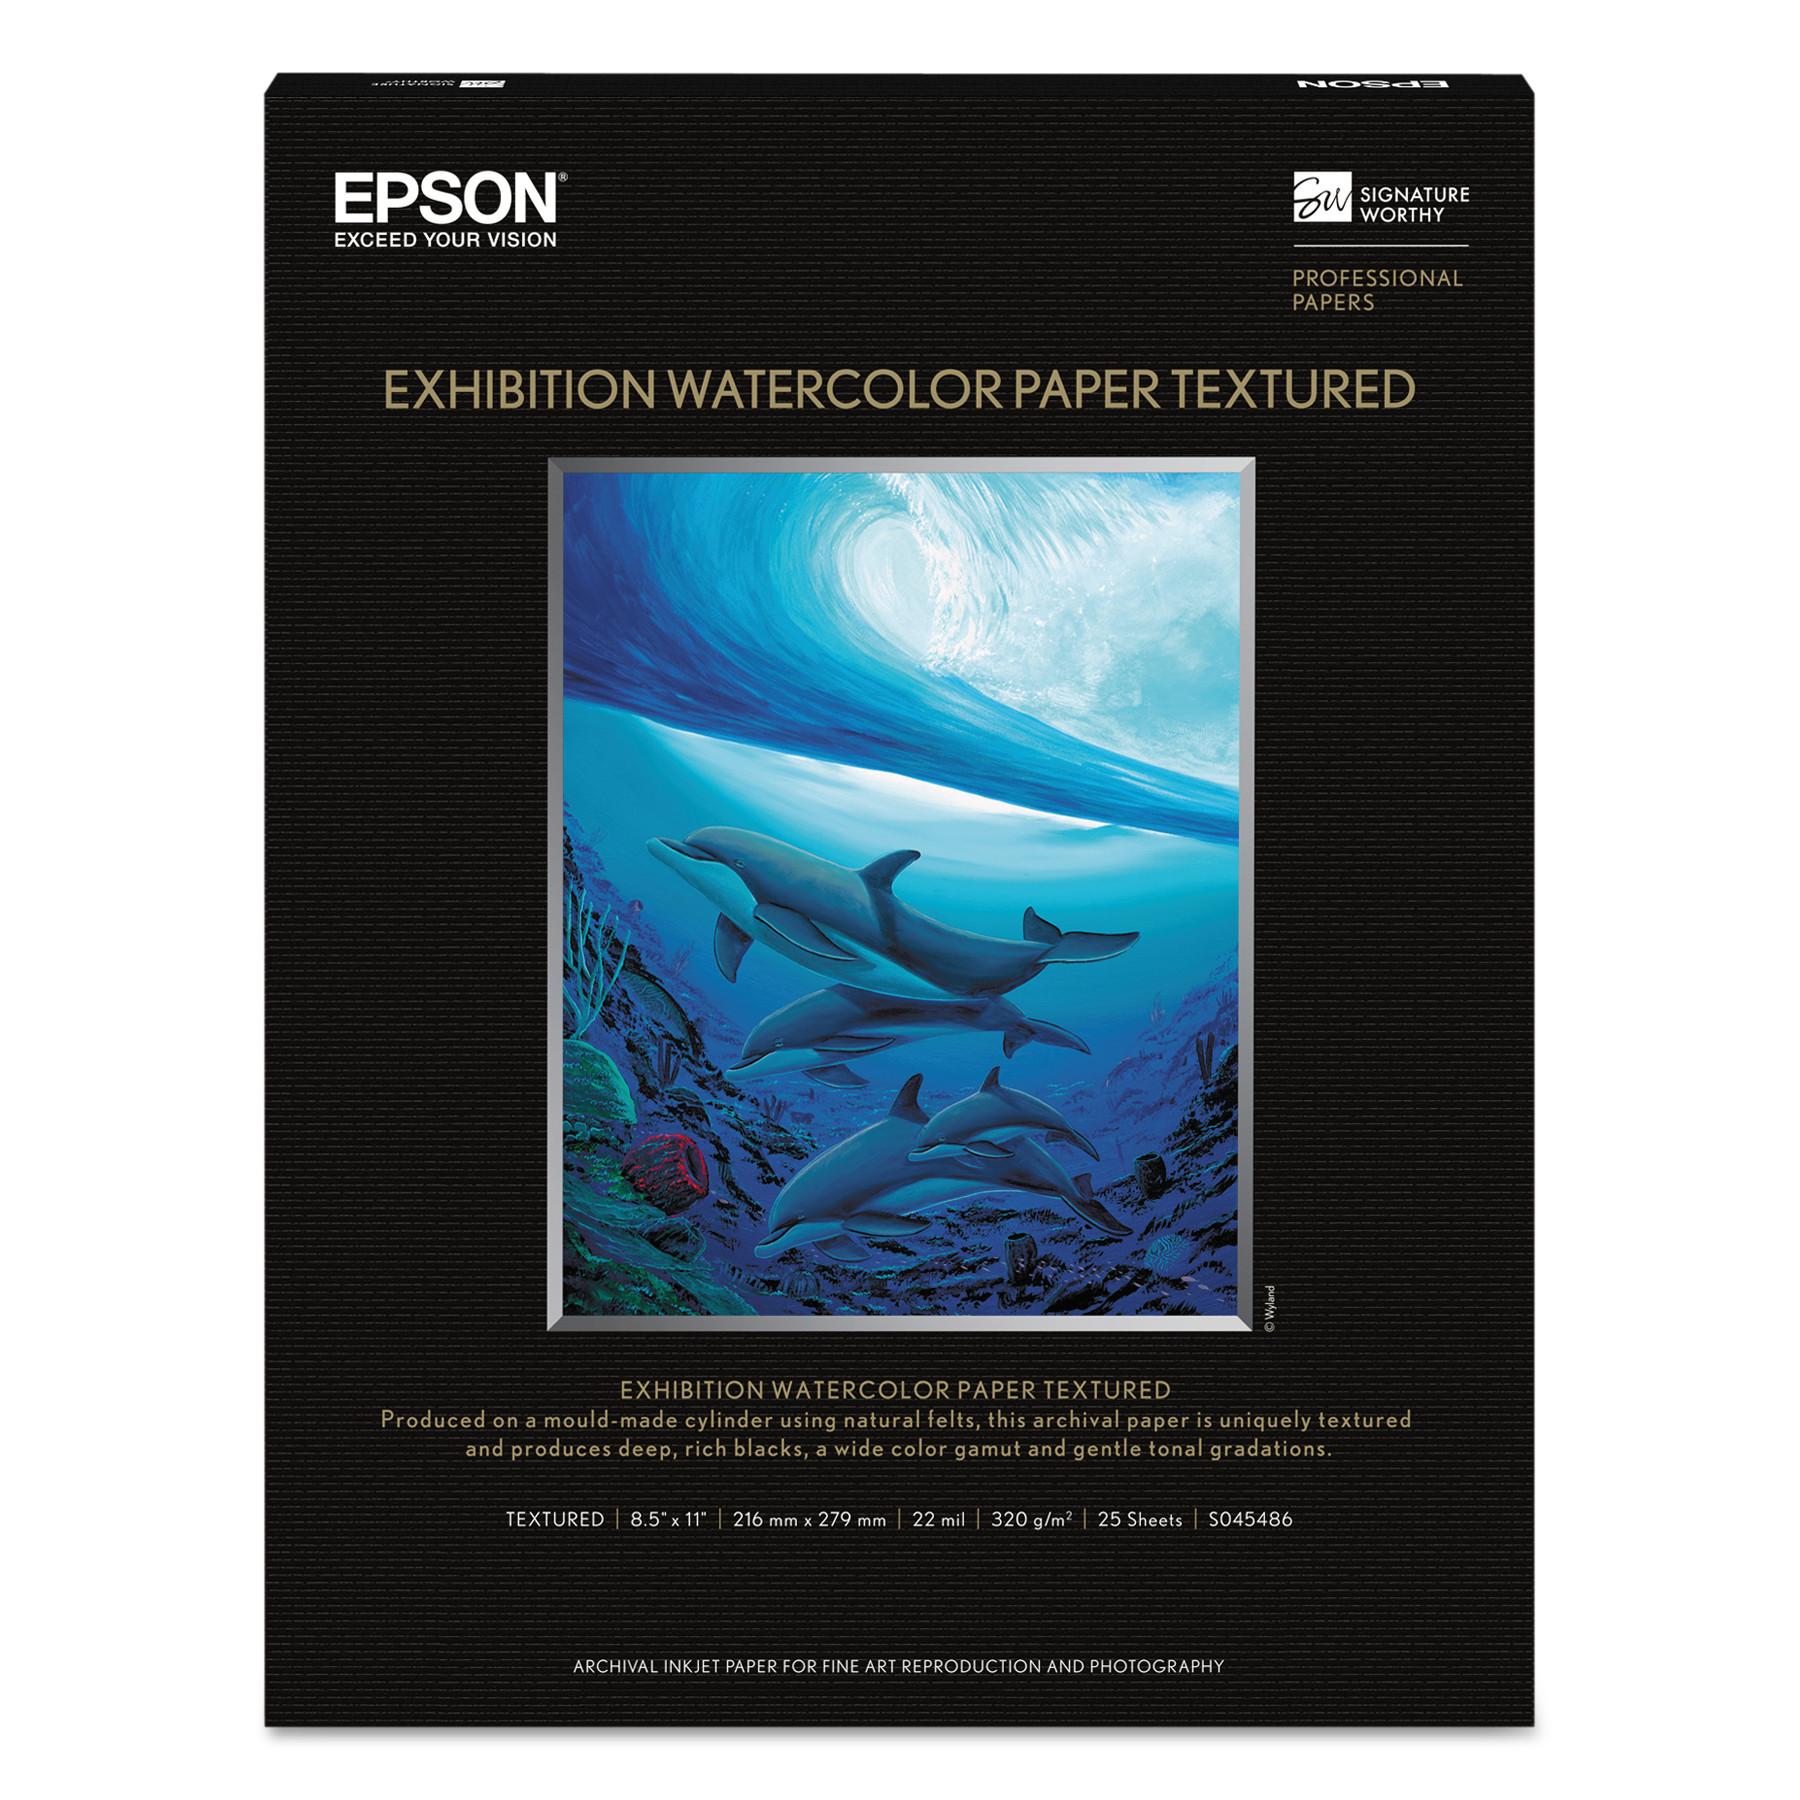 Epson Exhibition Textured Watercolor Paper, 8 1/2 x 11, White